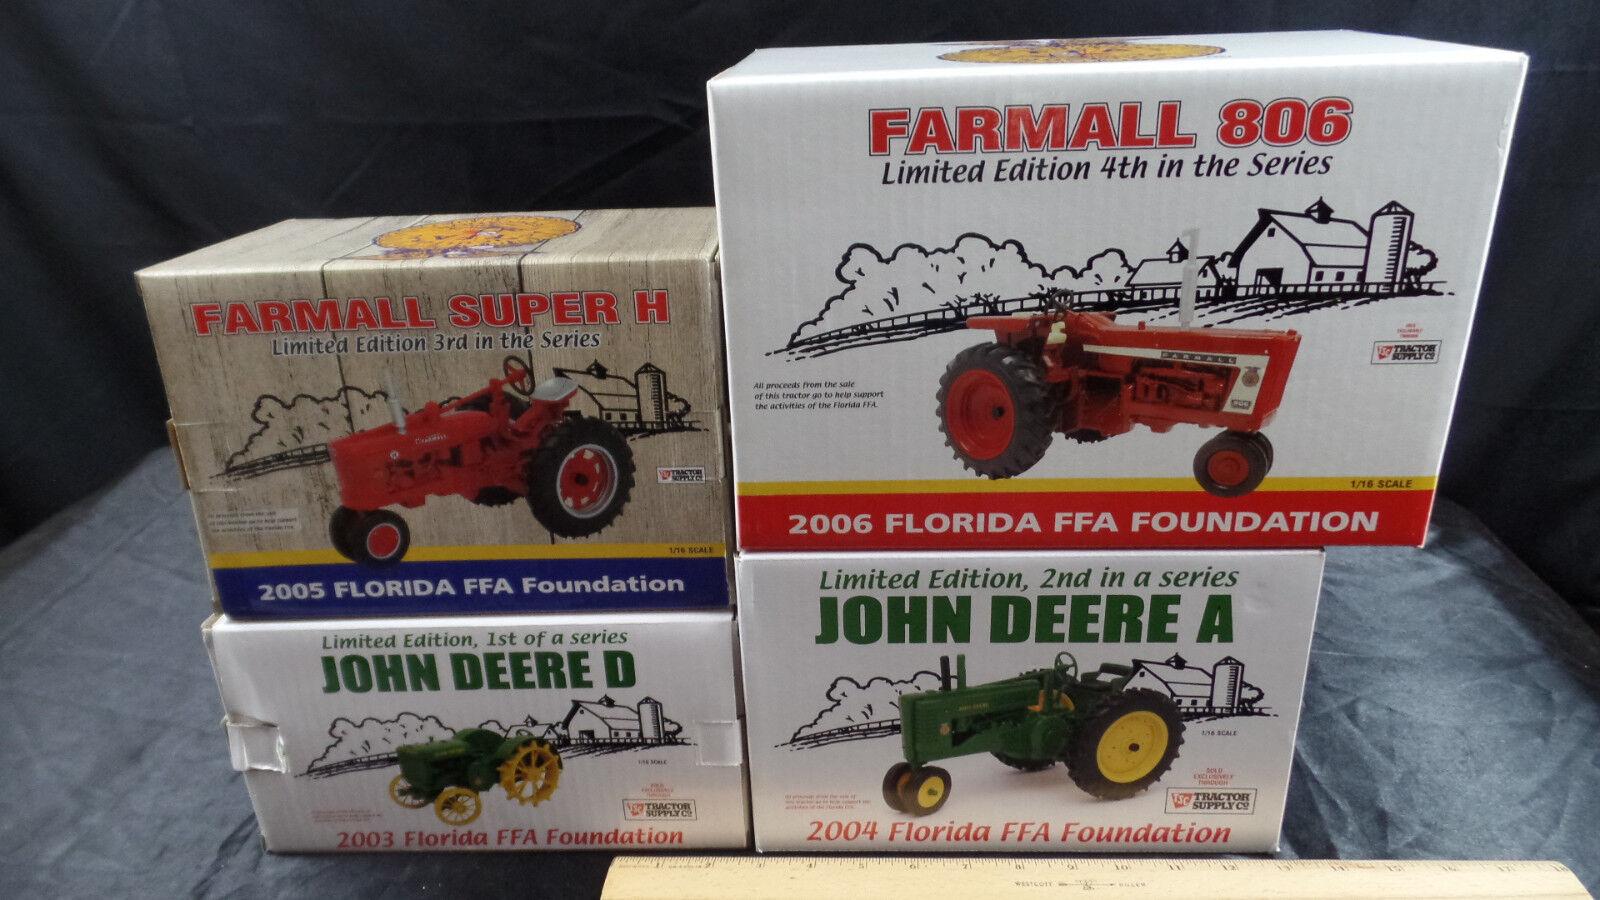 FLORIDA FFA FOUNDATION COLLECTIBLE TRACTOR SUPPLY JOHN DEERE FARMALL 2003-06 A9